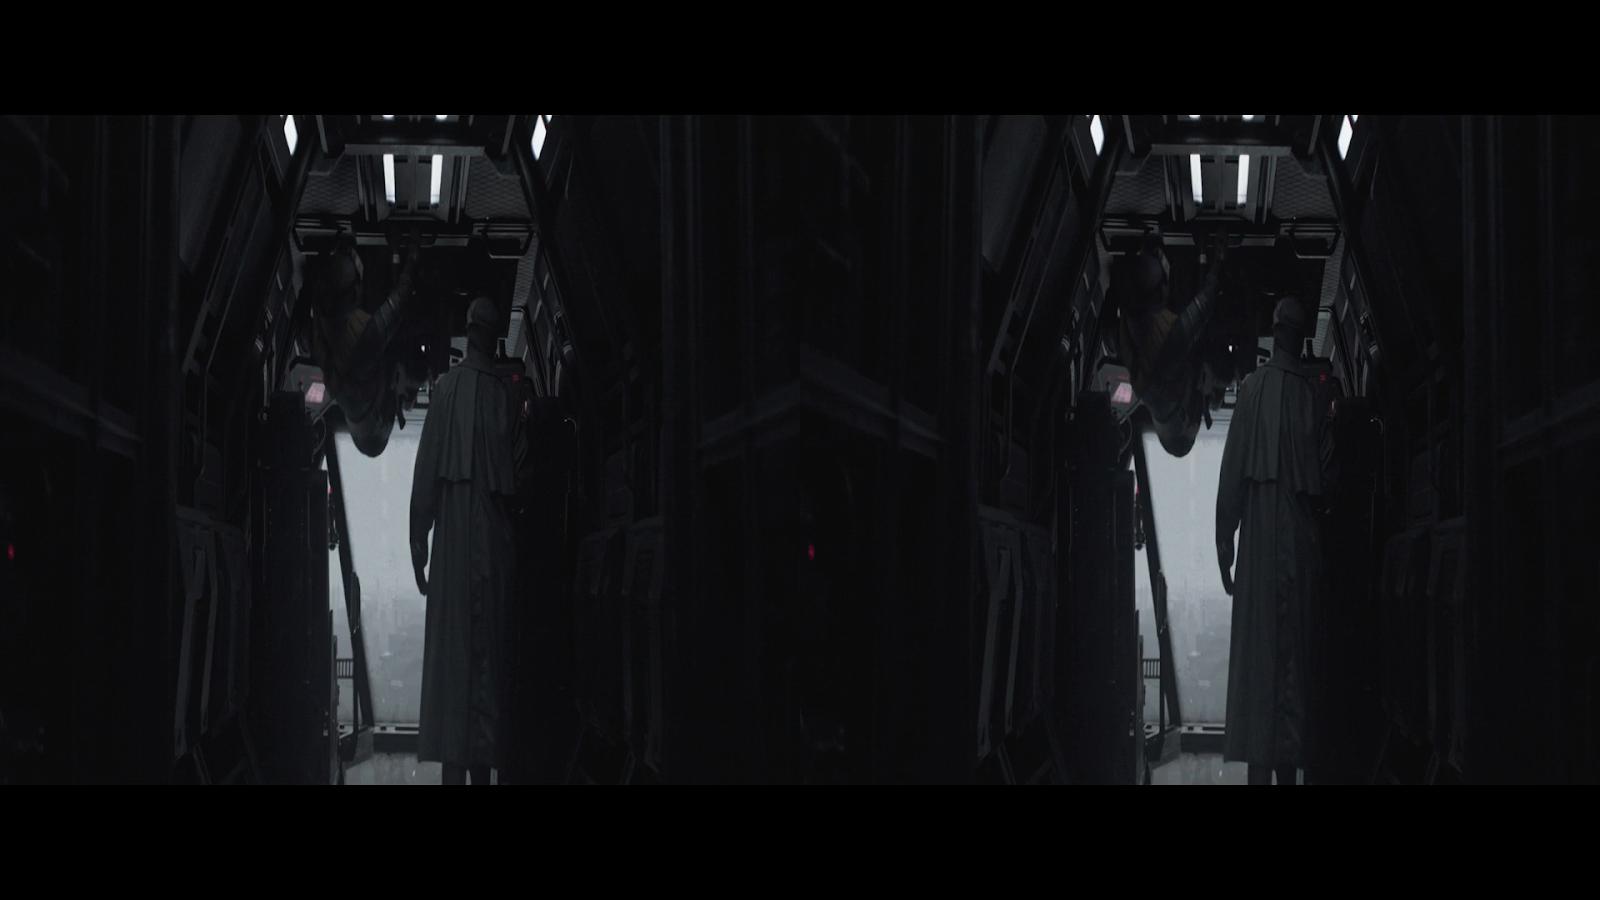 Han Solo: Una historia de Star Wars (2018) 3D SBS Full 1080p Latino-Castellano-Ingles captura 1